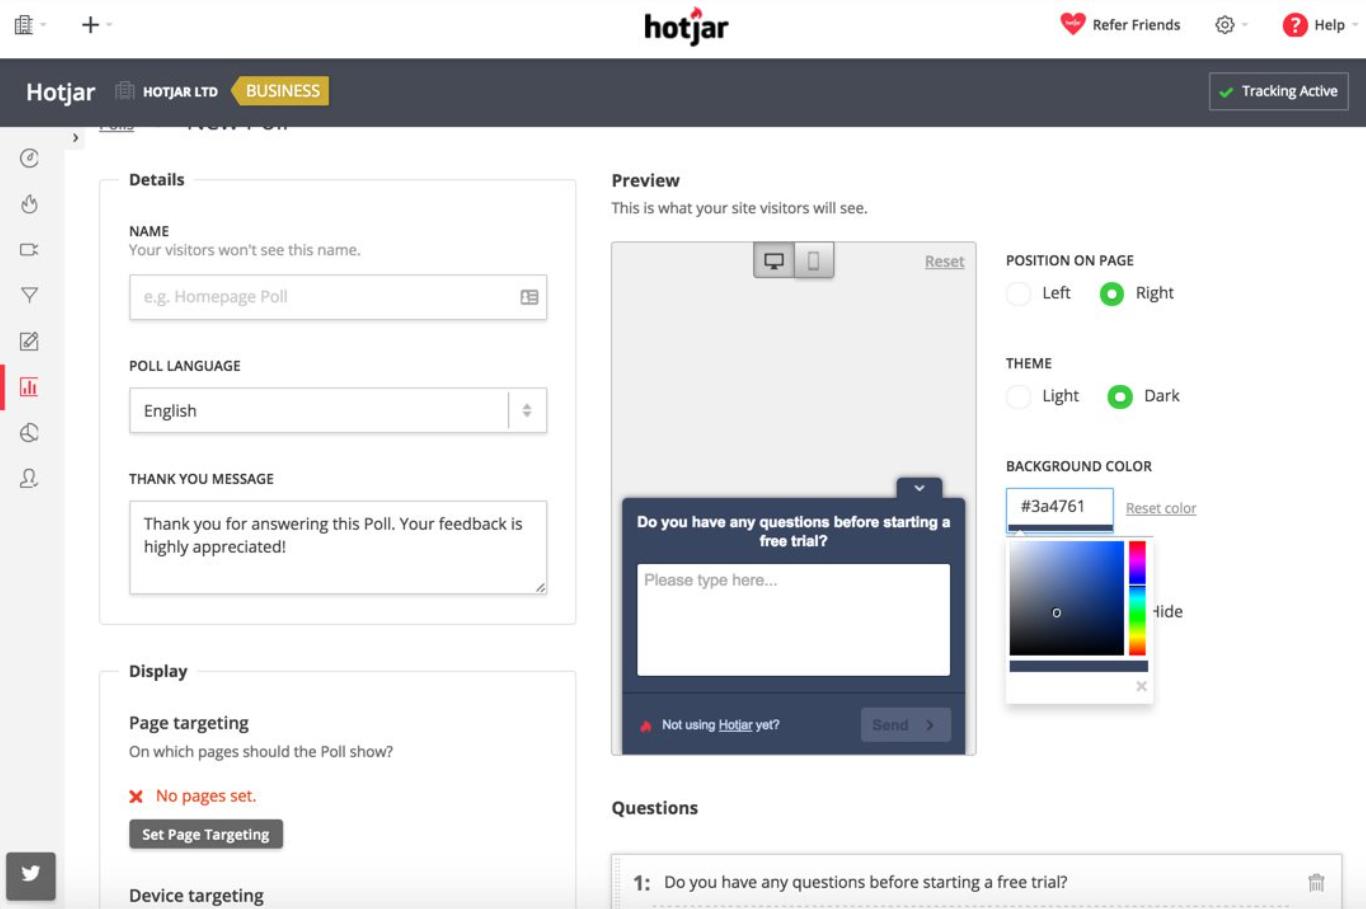 Hotjar survey preview